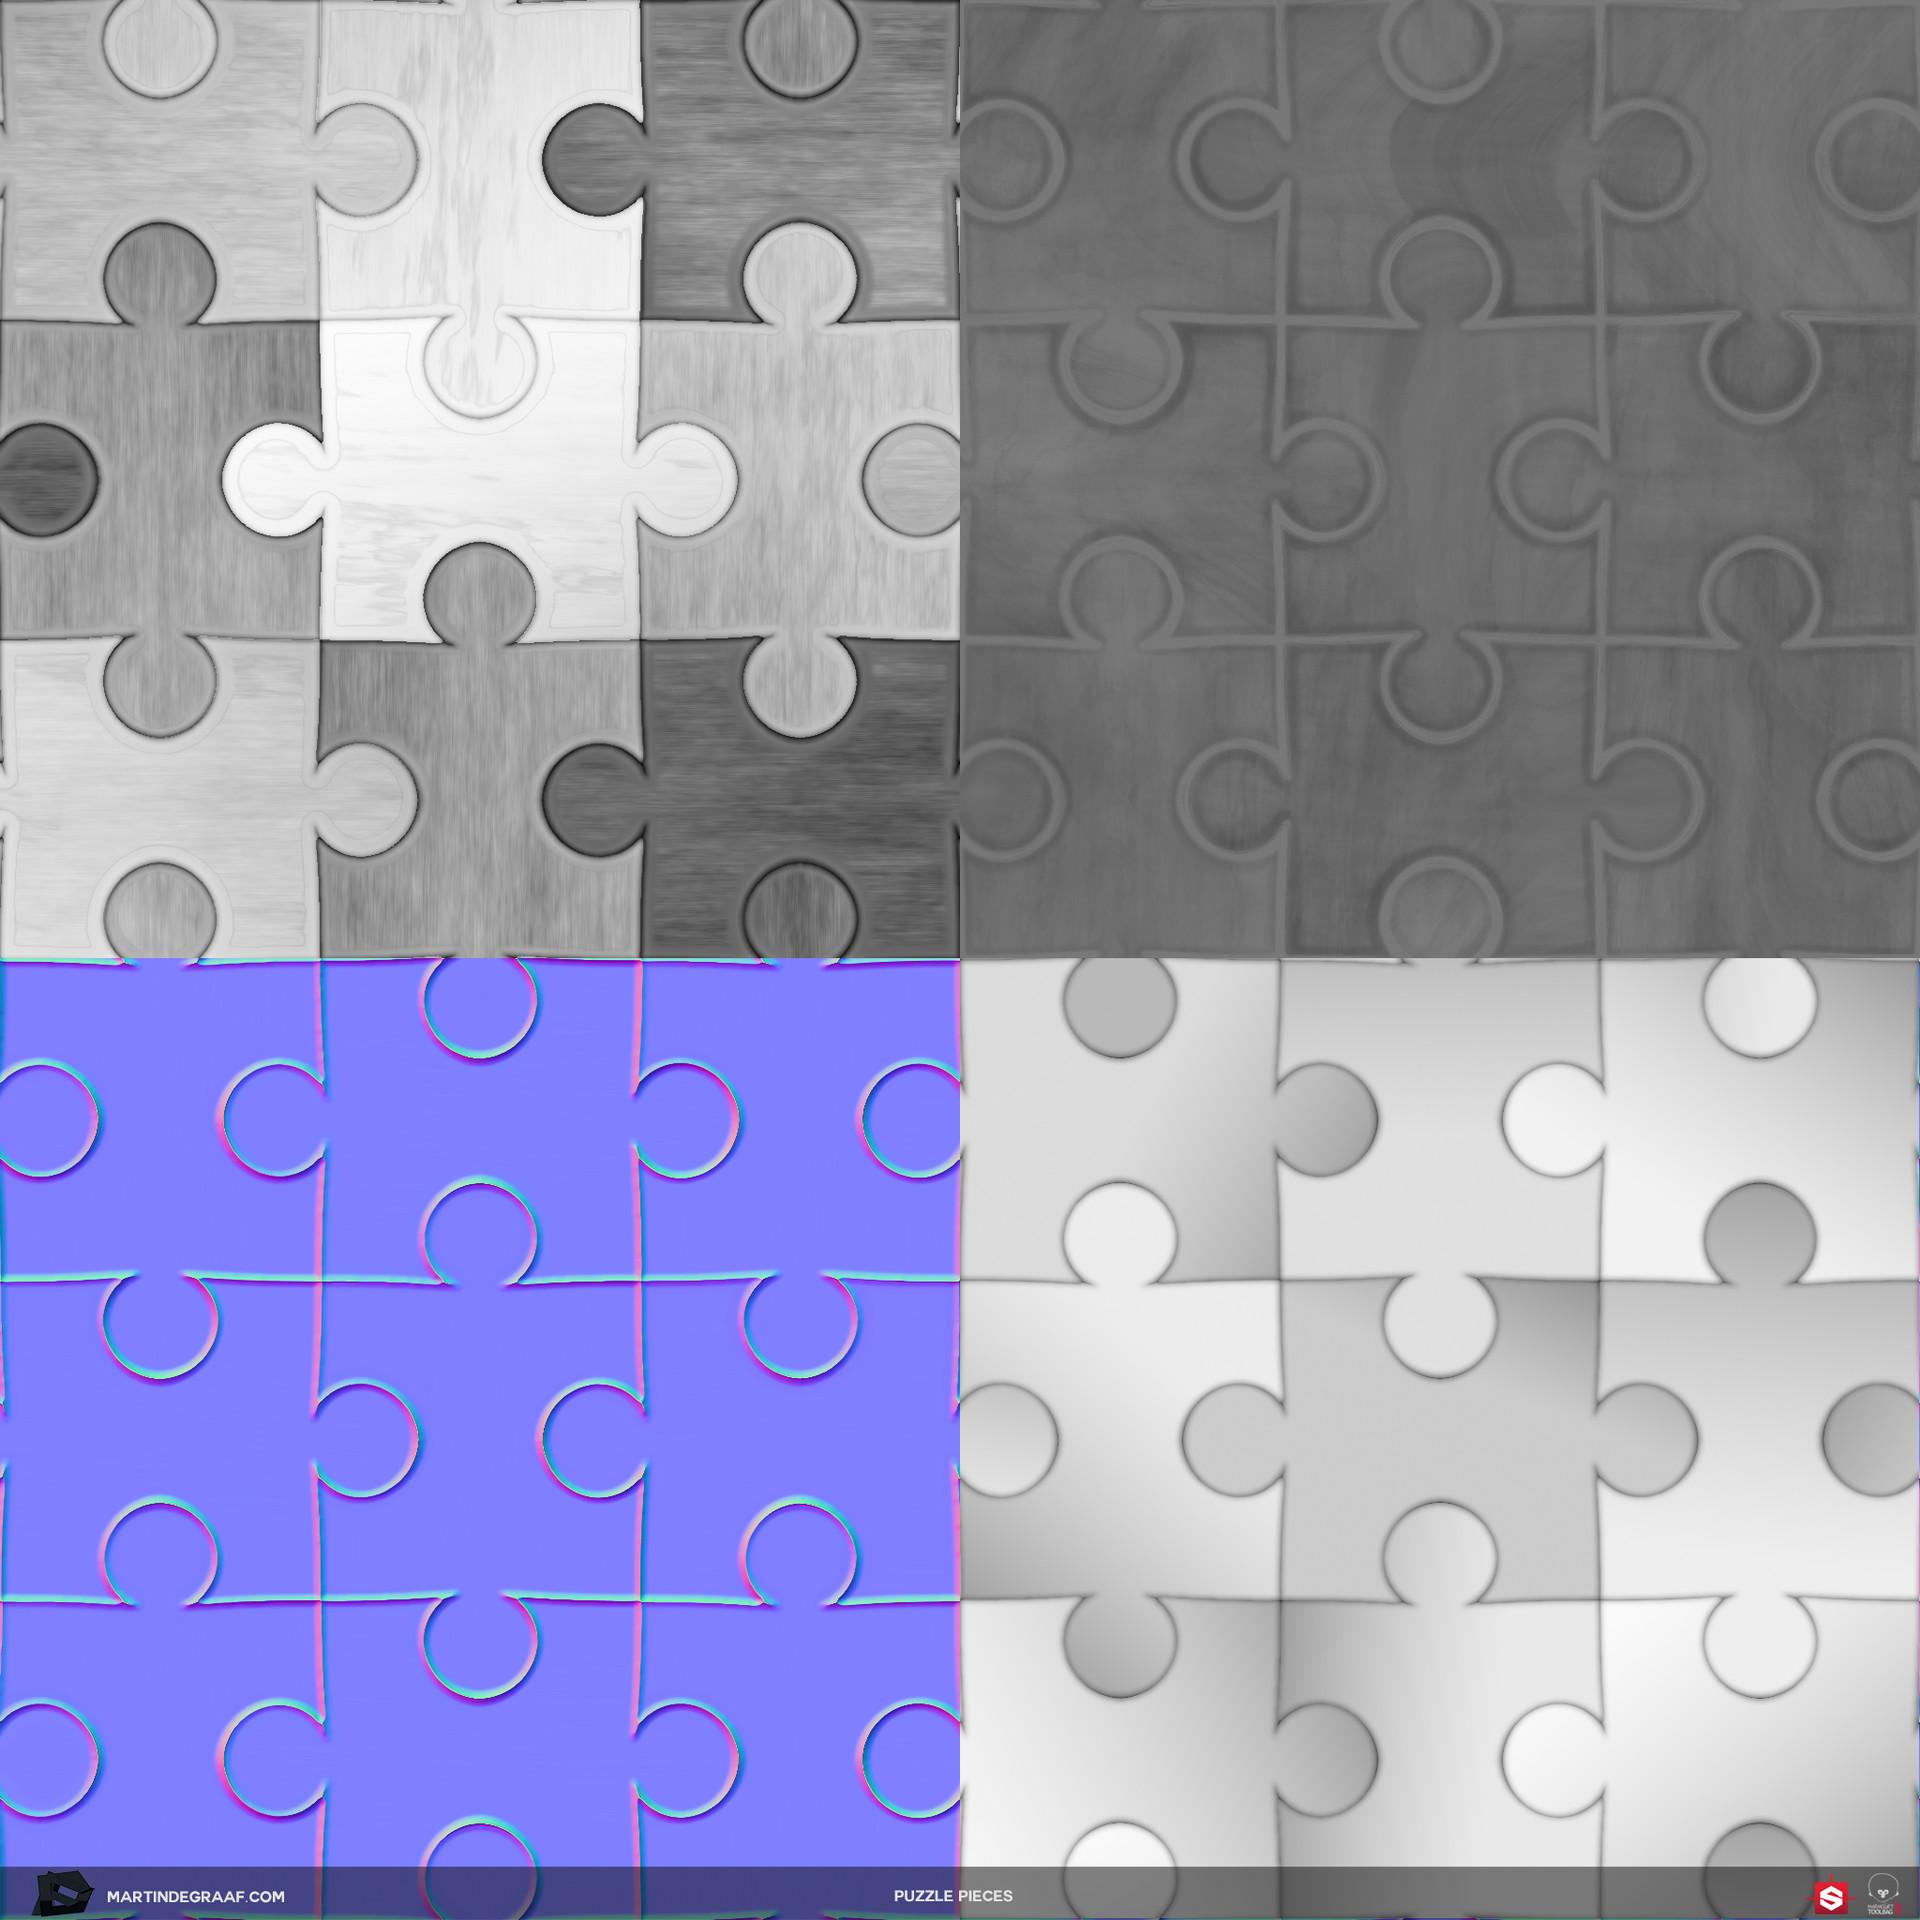 Martin de graaf puzzle pieces substance texturesheet martin de graaf 2018